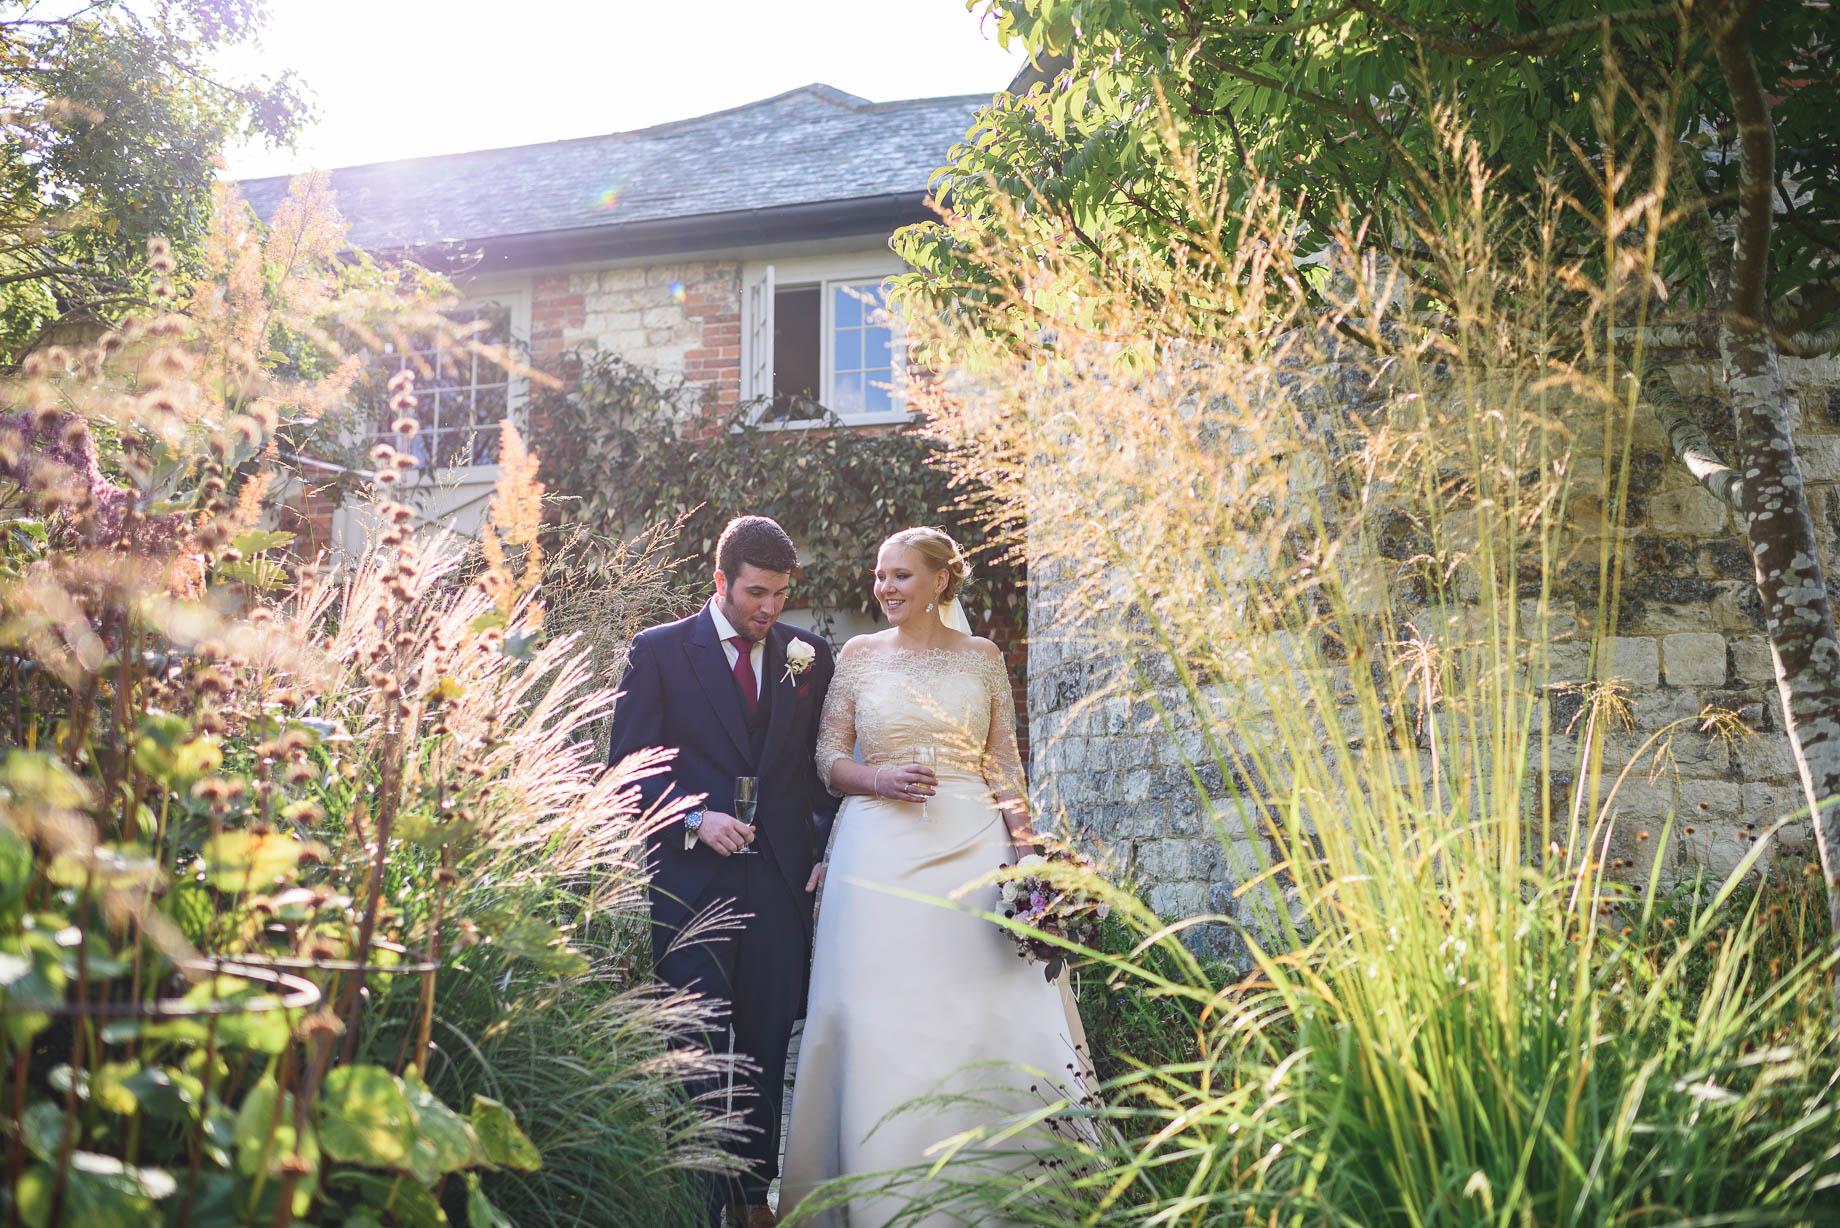 Bury Court Barn wedding photography - Guy Collier - Hannah and Mark (81 of 191)